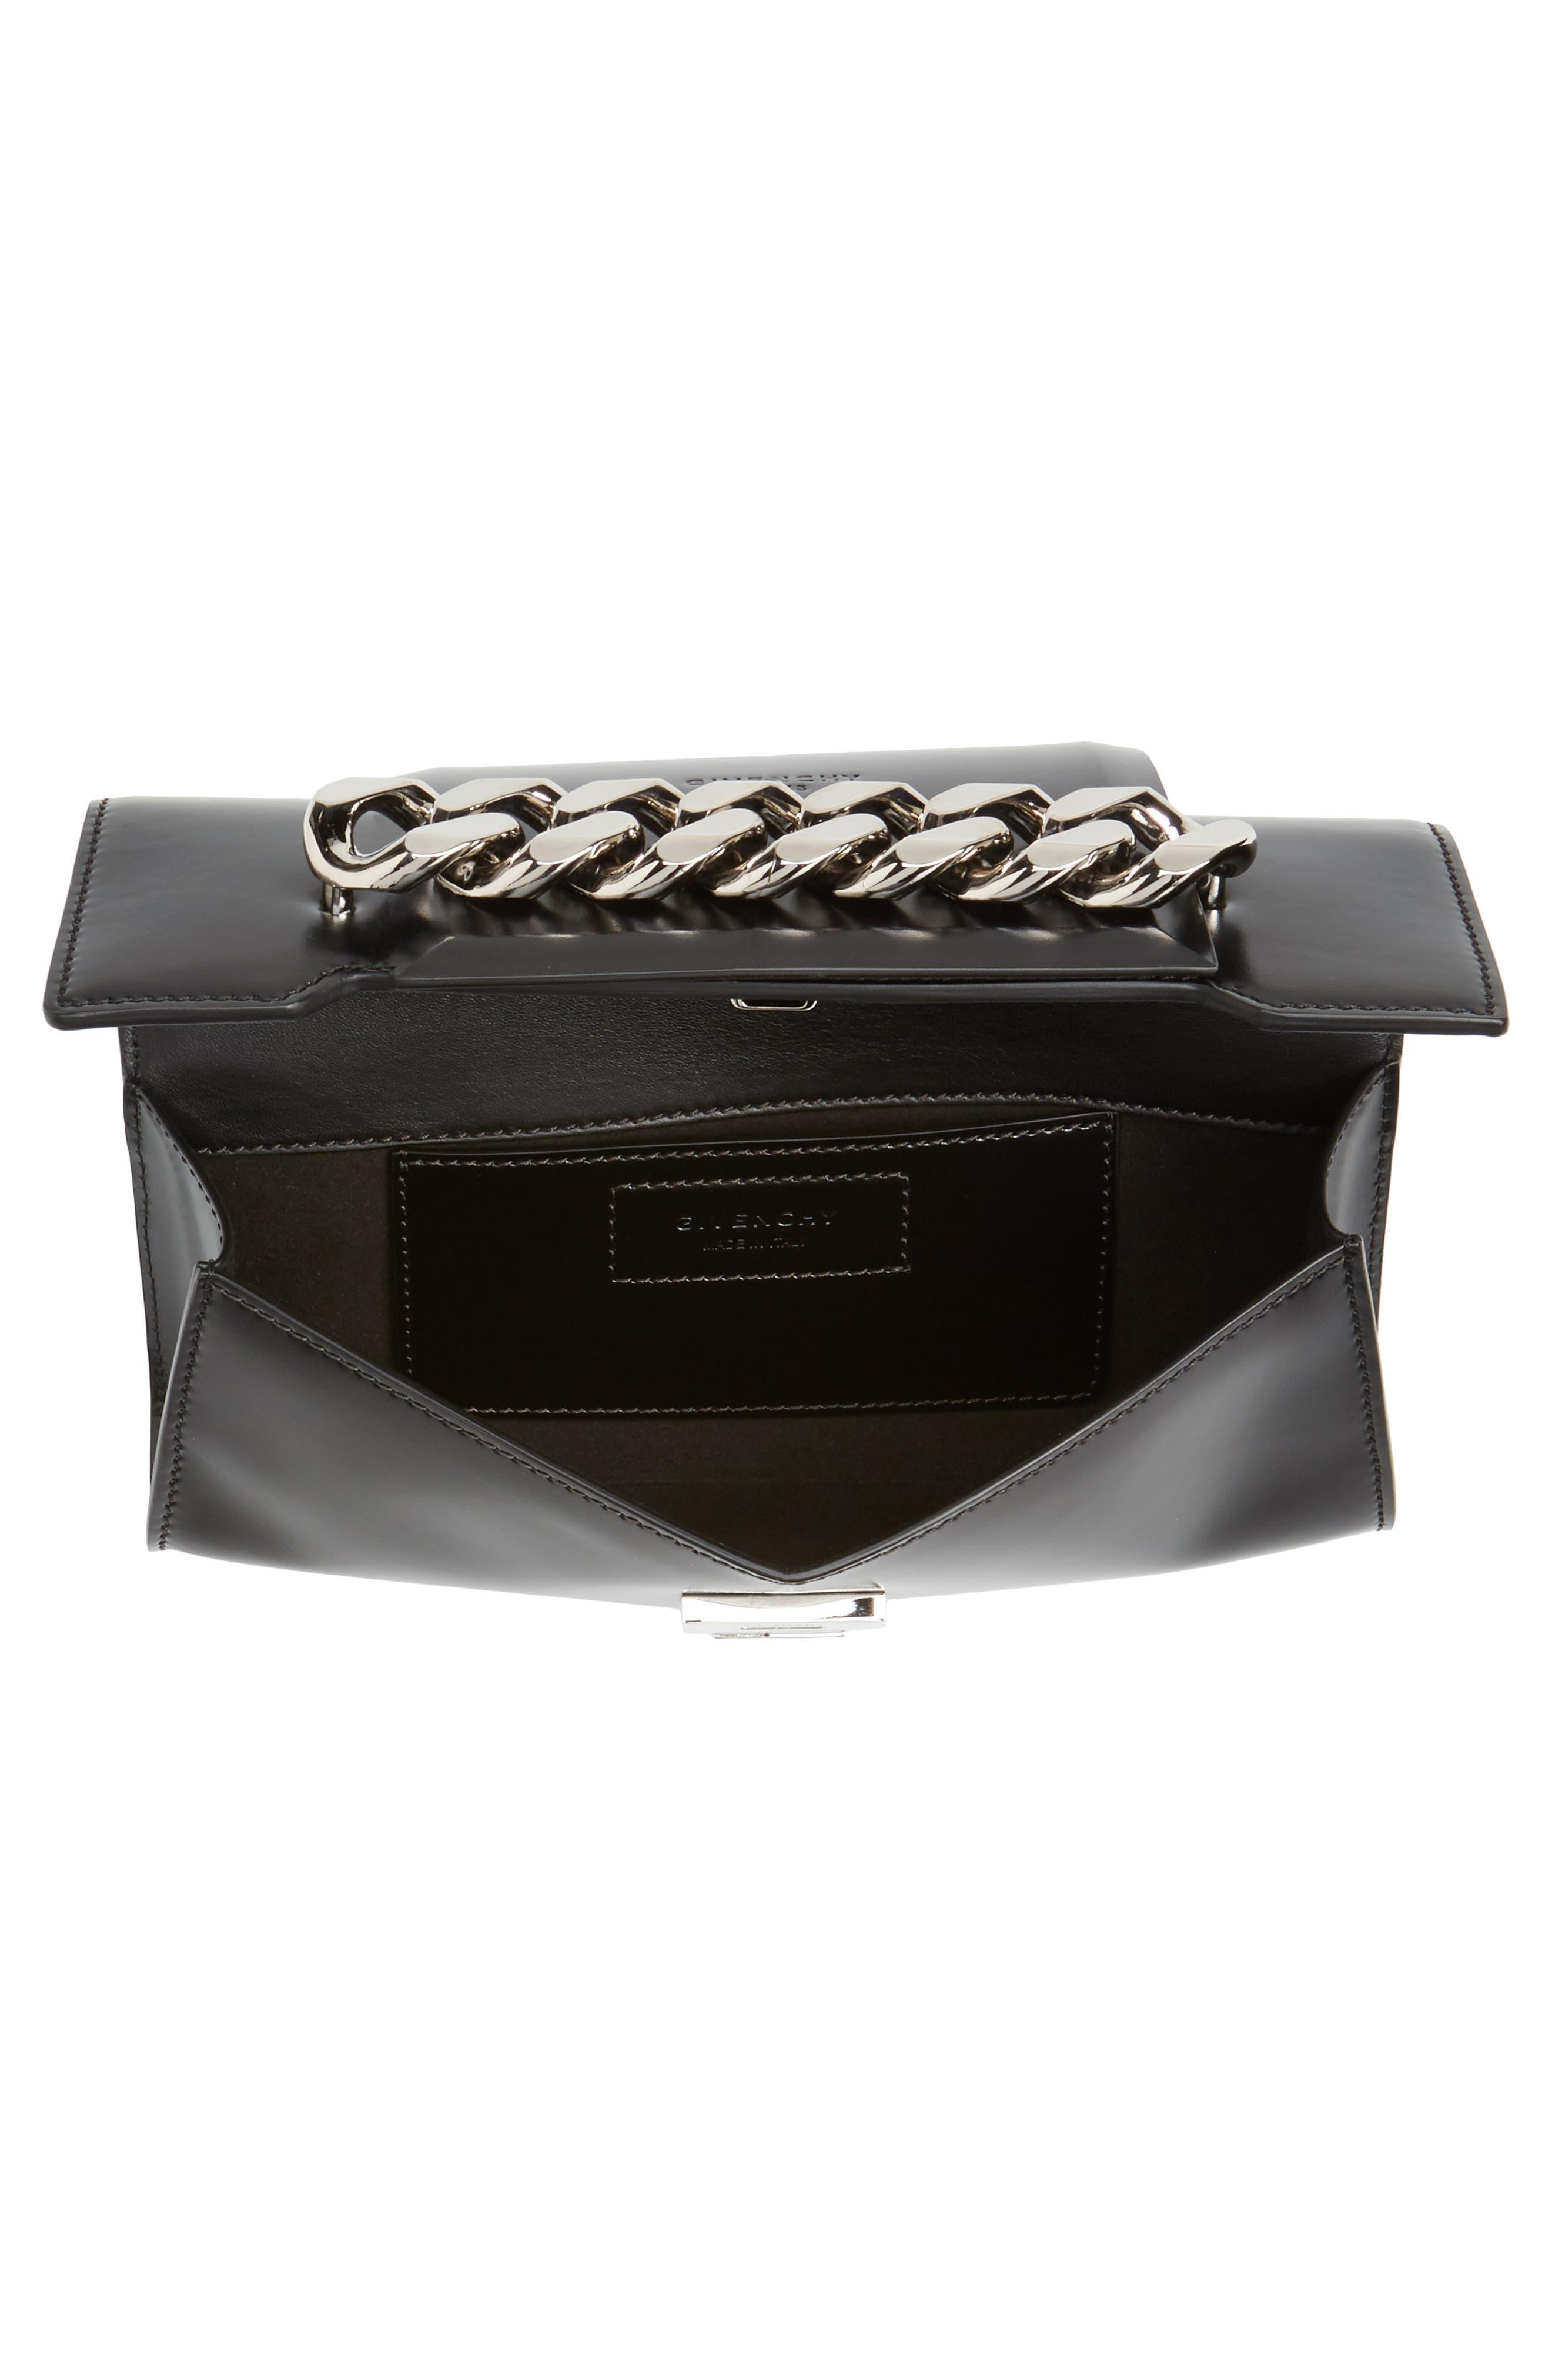 Mini Infinity Calfskin Leather Shoulder/Crossbody Bag,                             Alternate thumbnail 7, color,